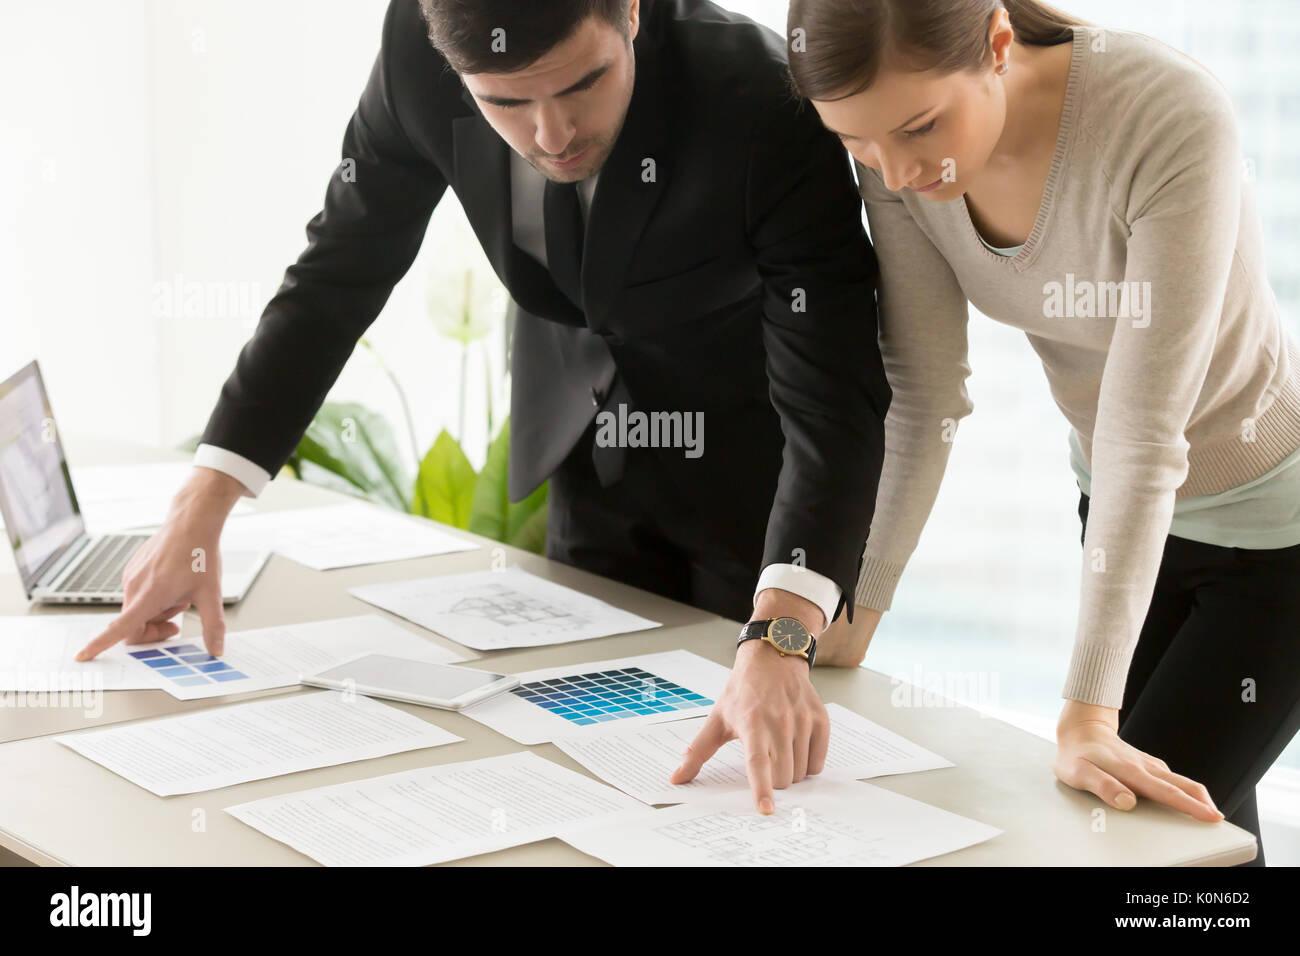 Building services design stock photos building services for Building services design